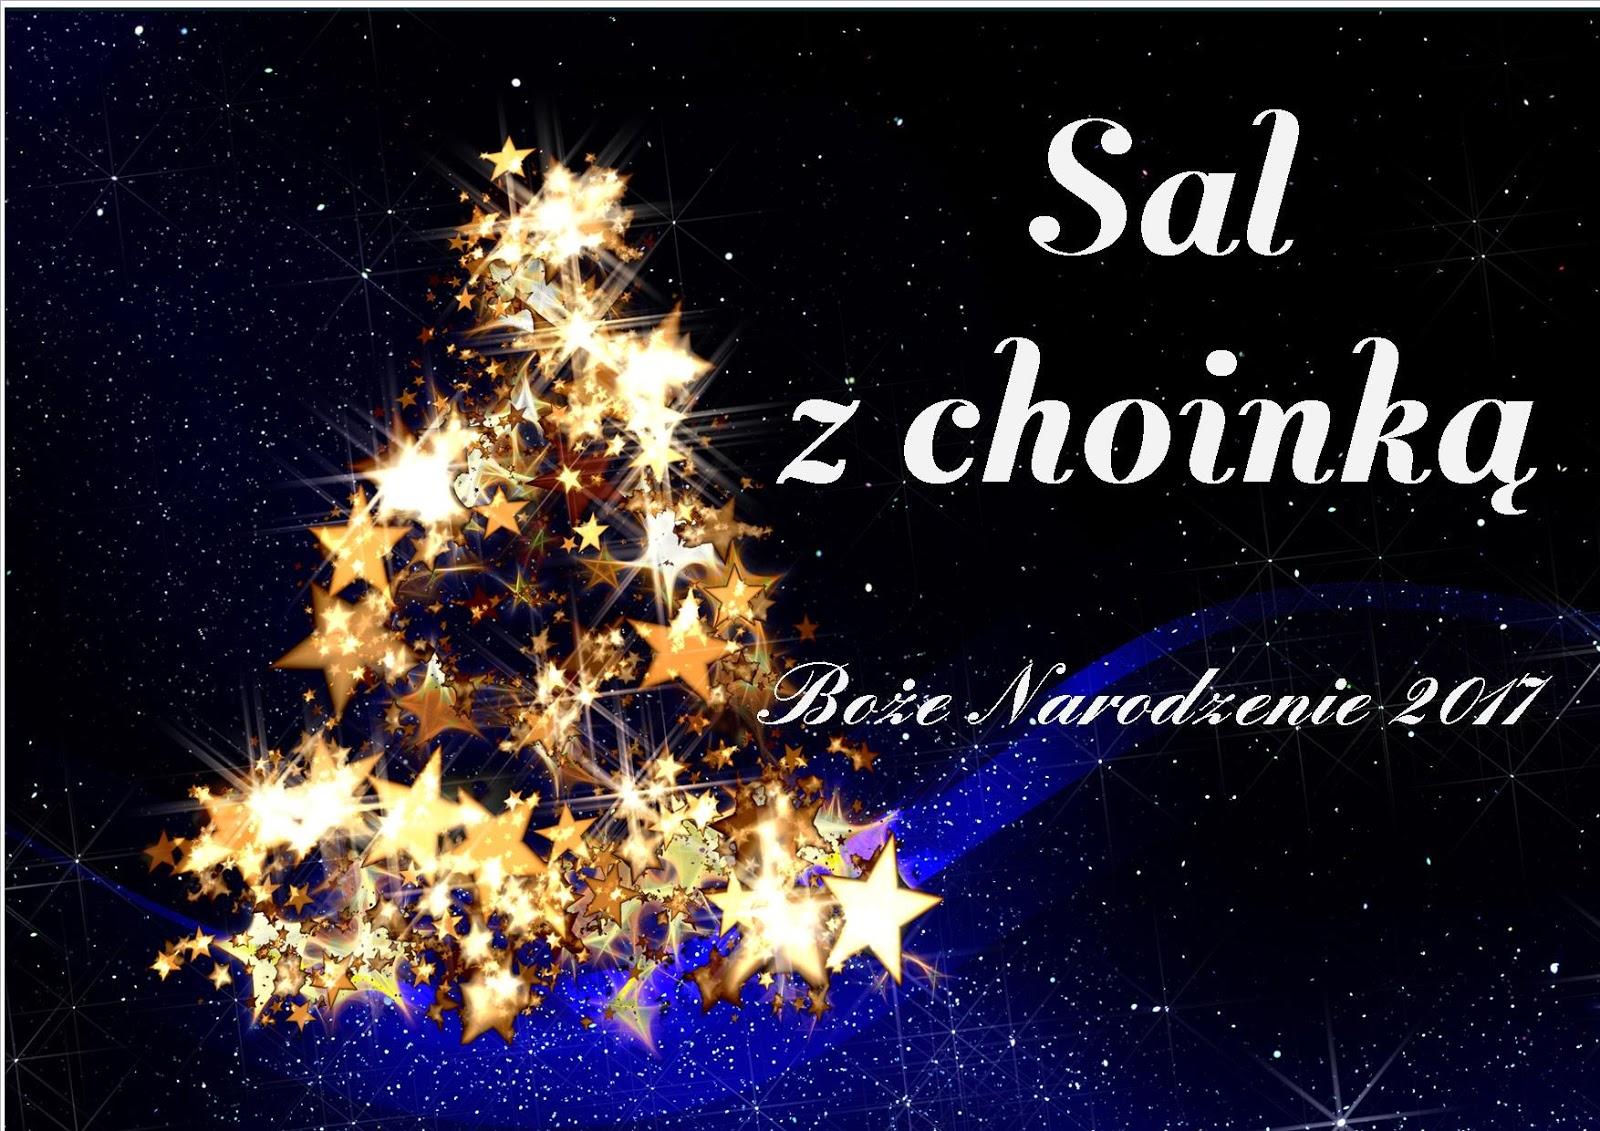 Sal choinka =)